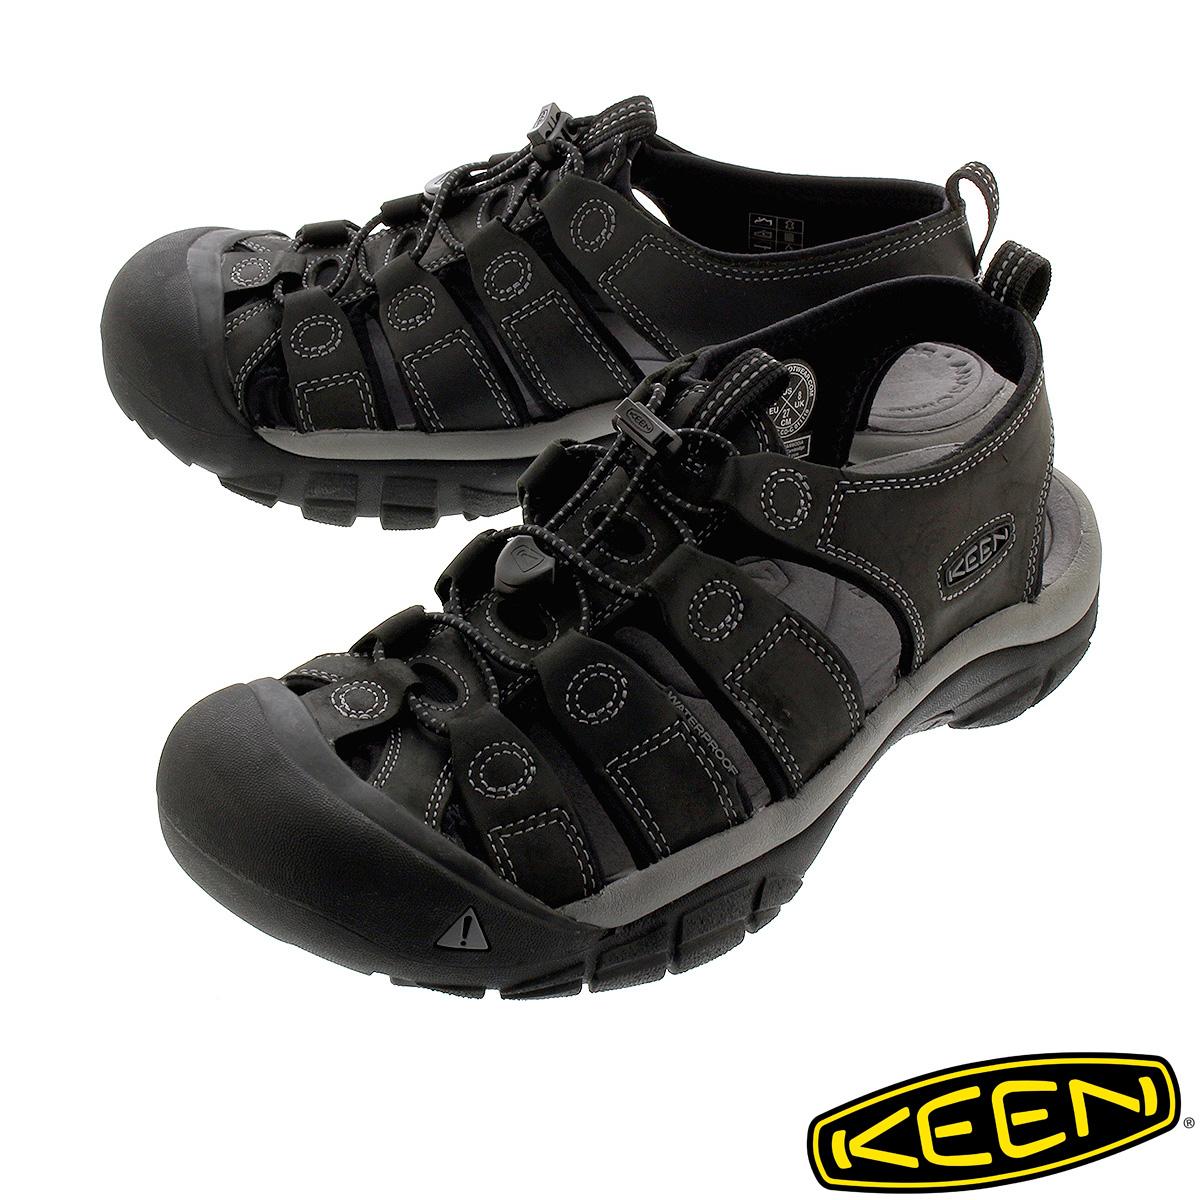 KEEN MEN NEWPORT 【メンズ】 キーン メン ニューポート BLACK/STEEL GREY 1022247